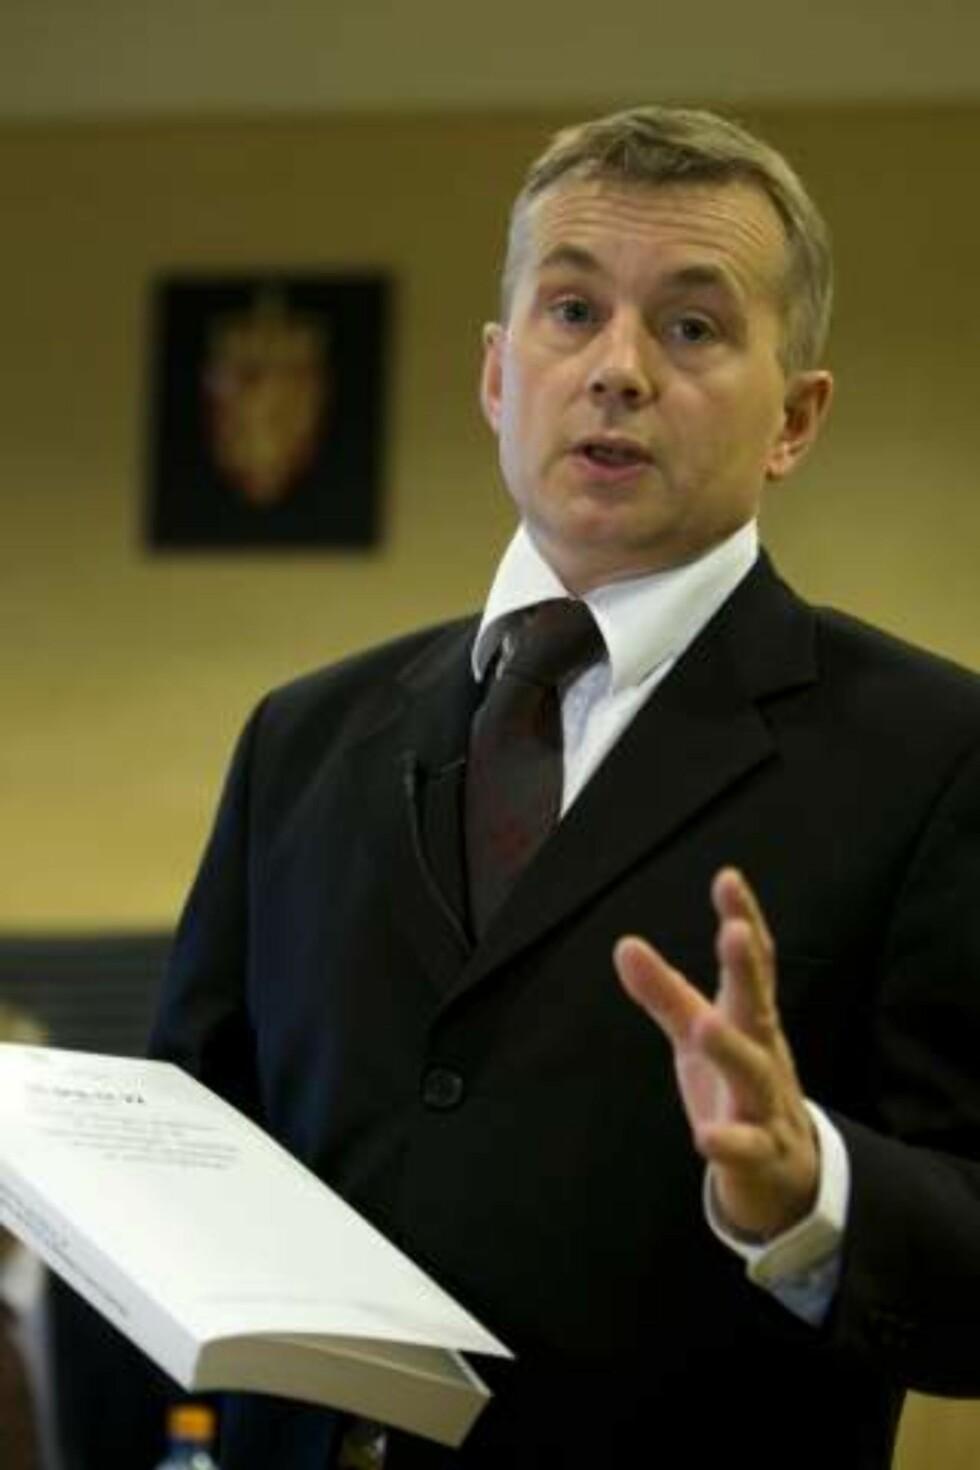 TOK SELVKRITIKK: Justisminister Knut Storberget innrømmer at han burde trukket tilbake den omstridte pressemeldingen om hijab i politiet umiddelbart. Foto: Scanpix